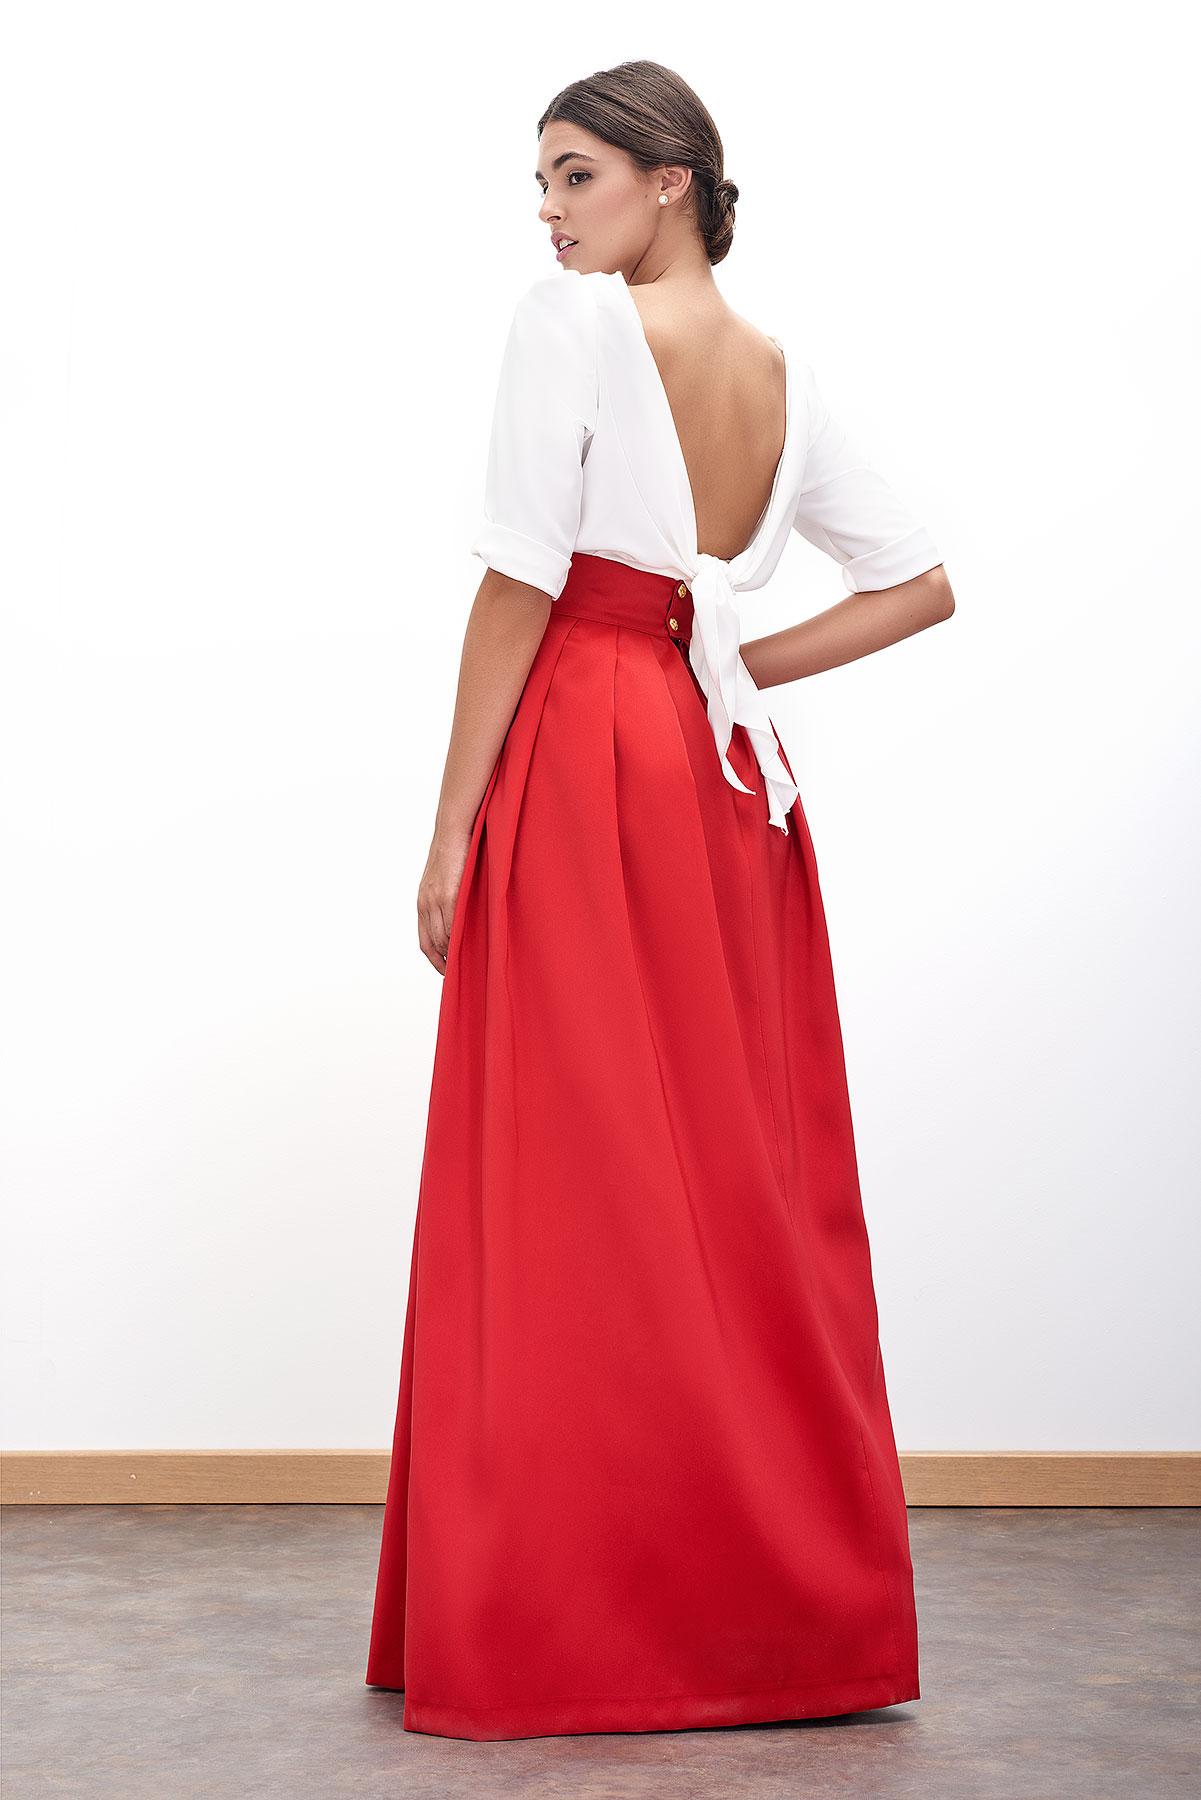 falda de fiesta larga roja de fatima angulo